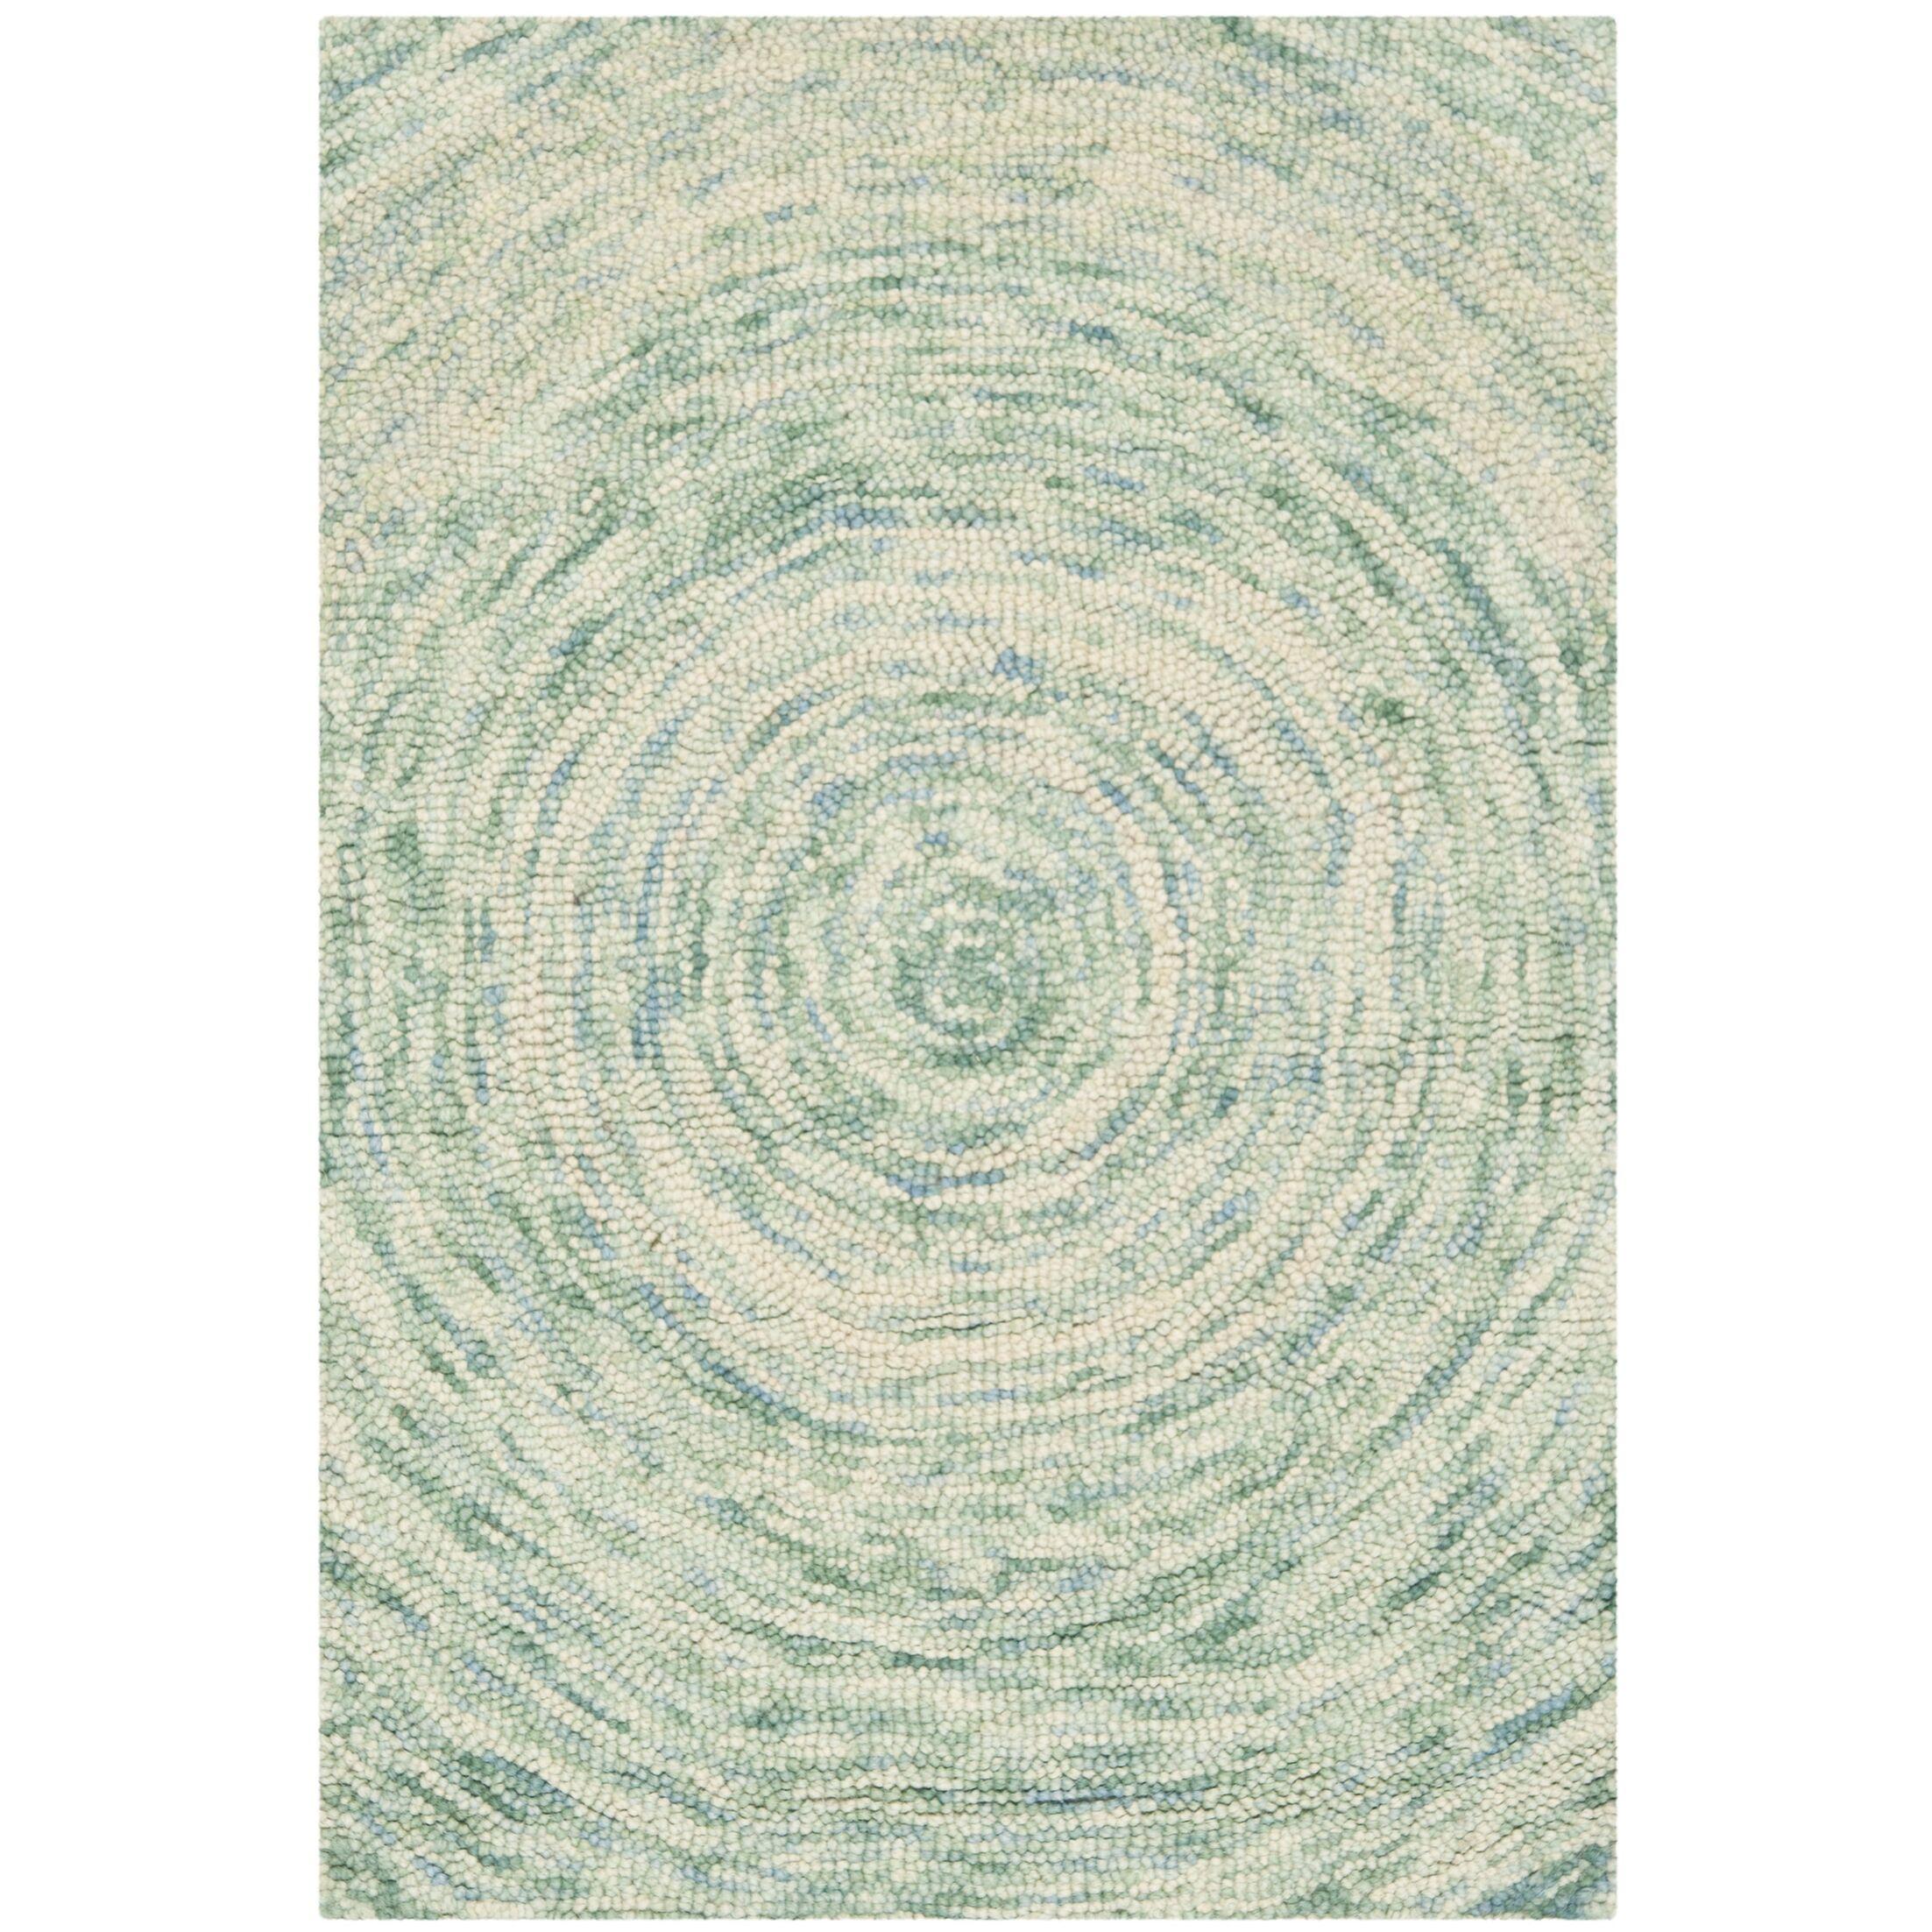 Ikat Ivory/Blue Area Rug Rug Size: Rectangle 3' x 5'